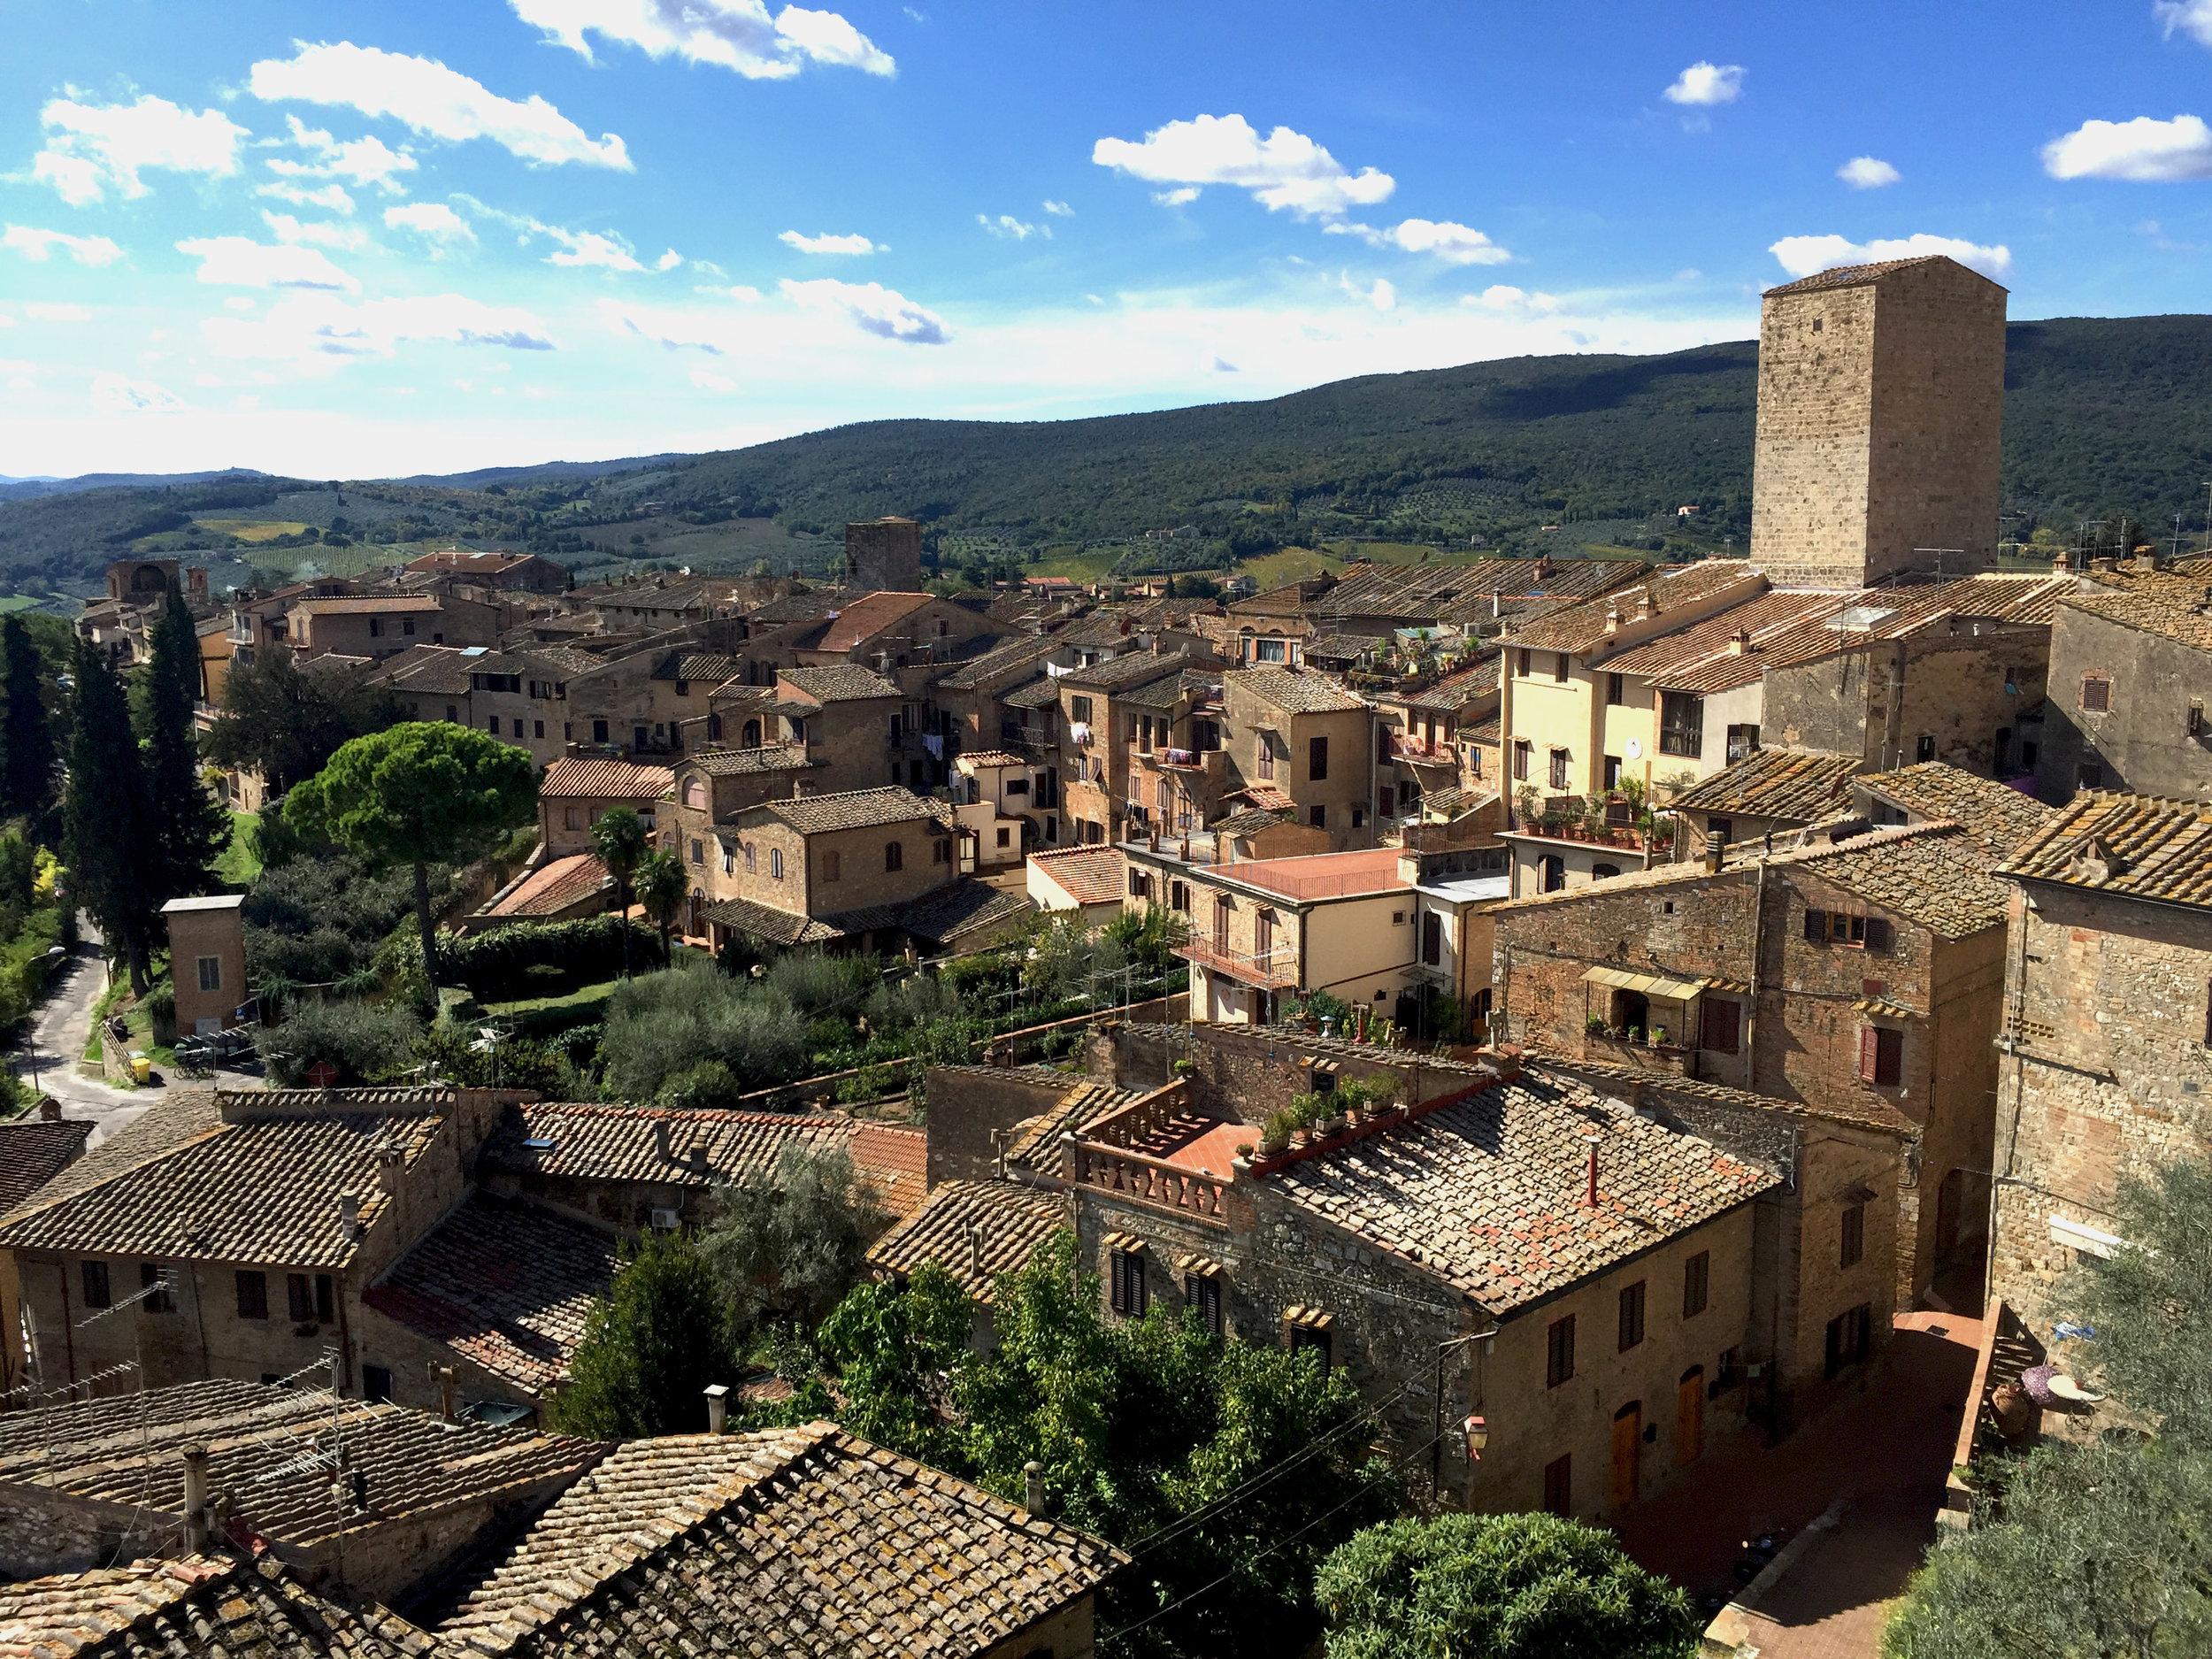 San Gimignano view2.jpg